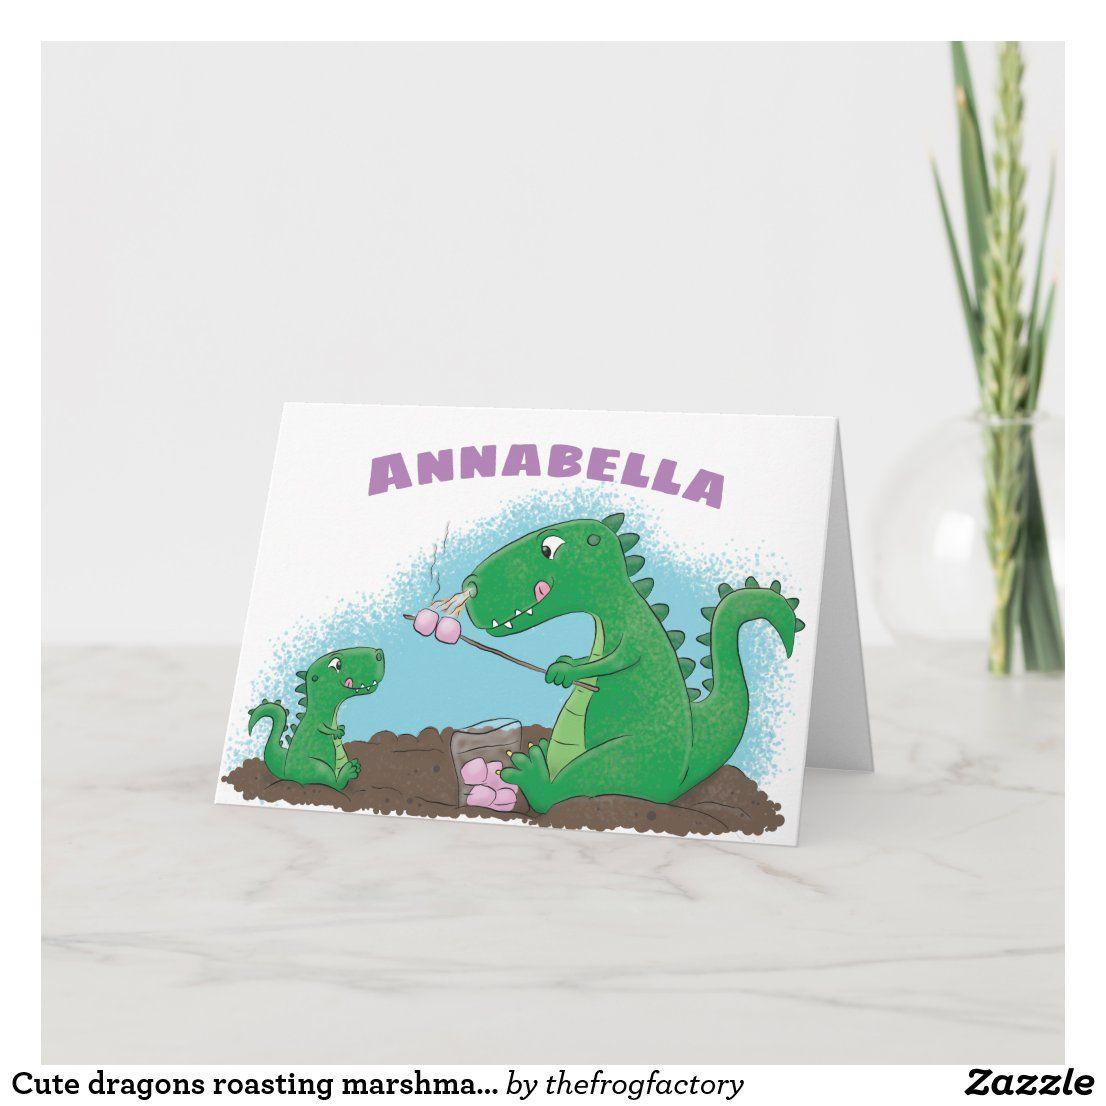 Cute Dragons Roasting Marshmallows Cartoon Card In 2020 Cute Dragons Marshmallow Cute